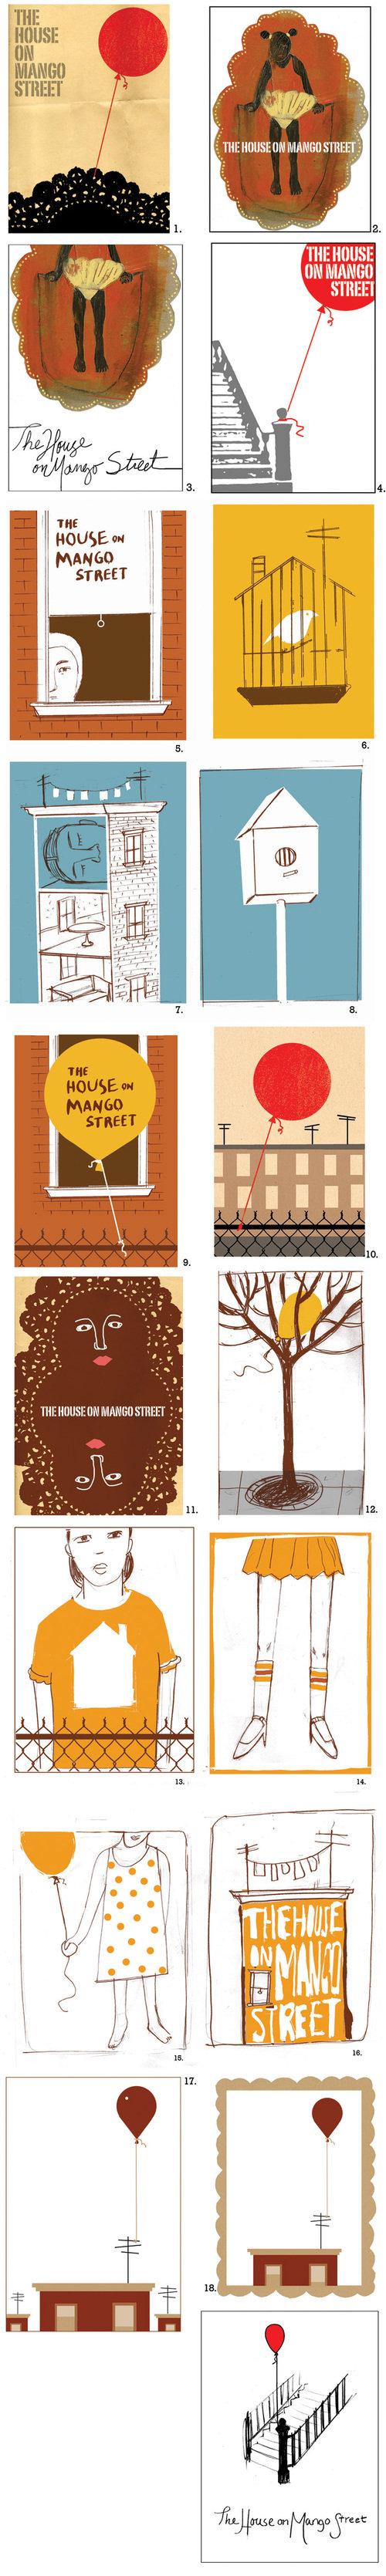 house on mango street 25th anniversary ed